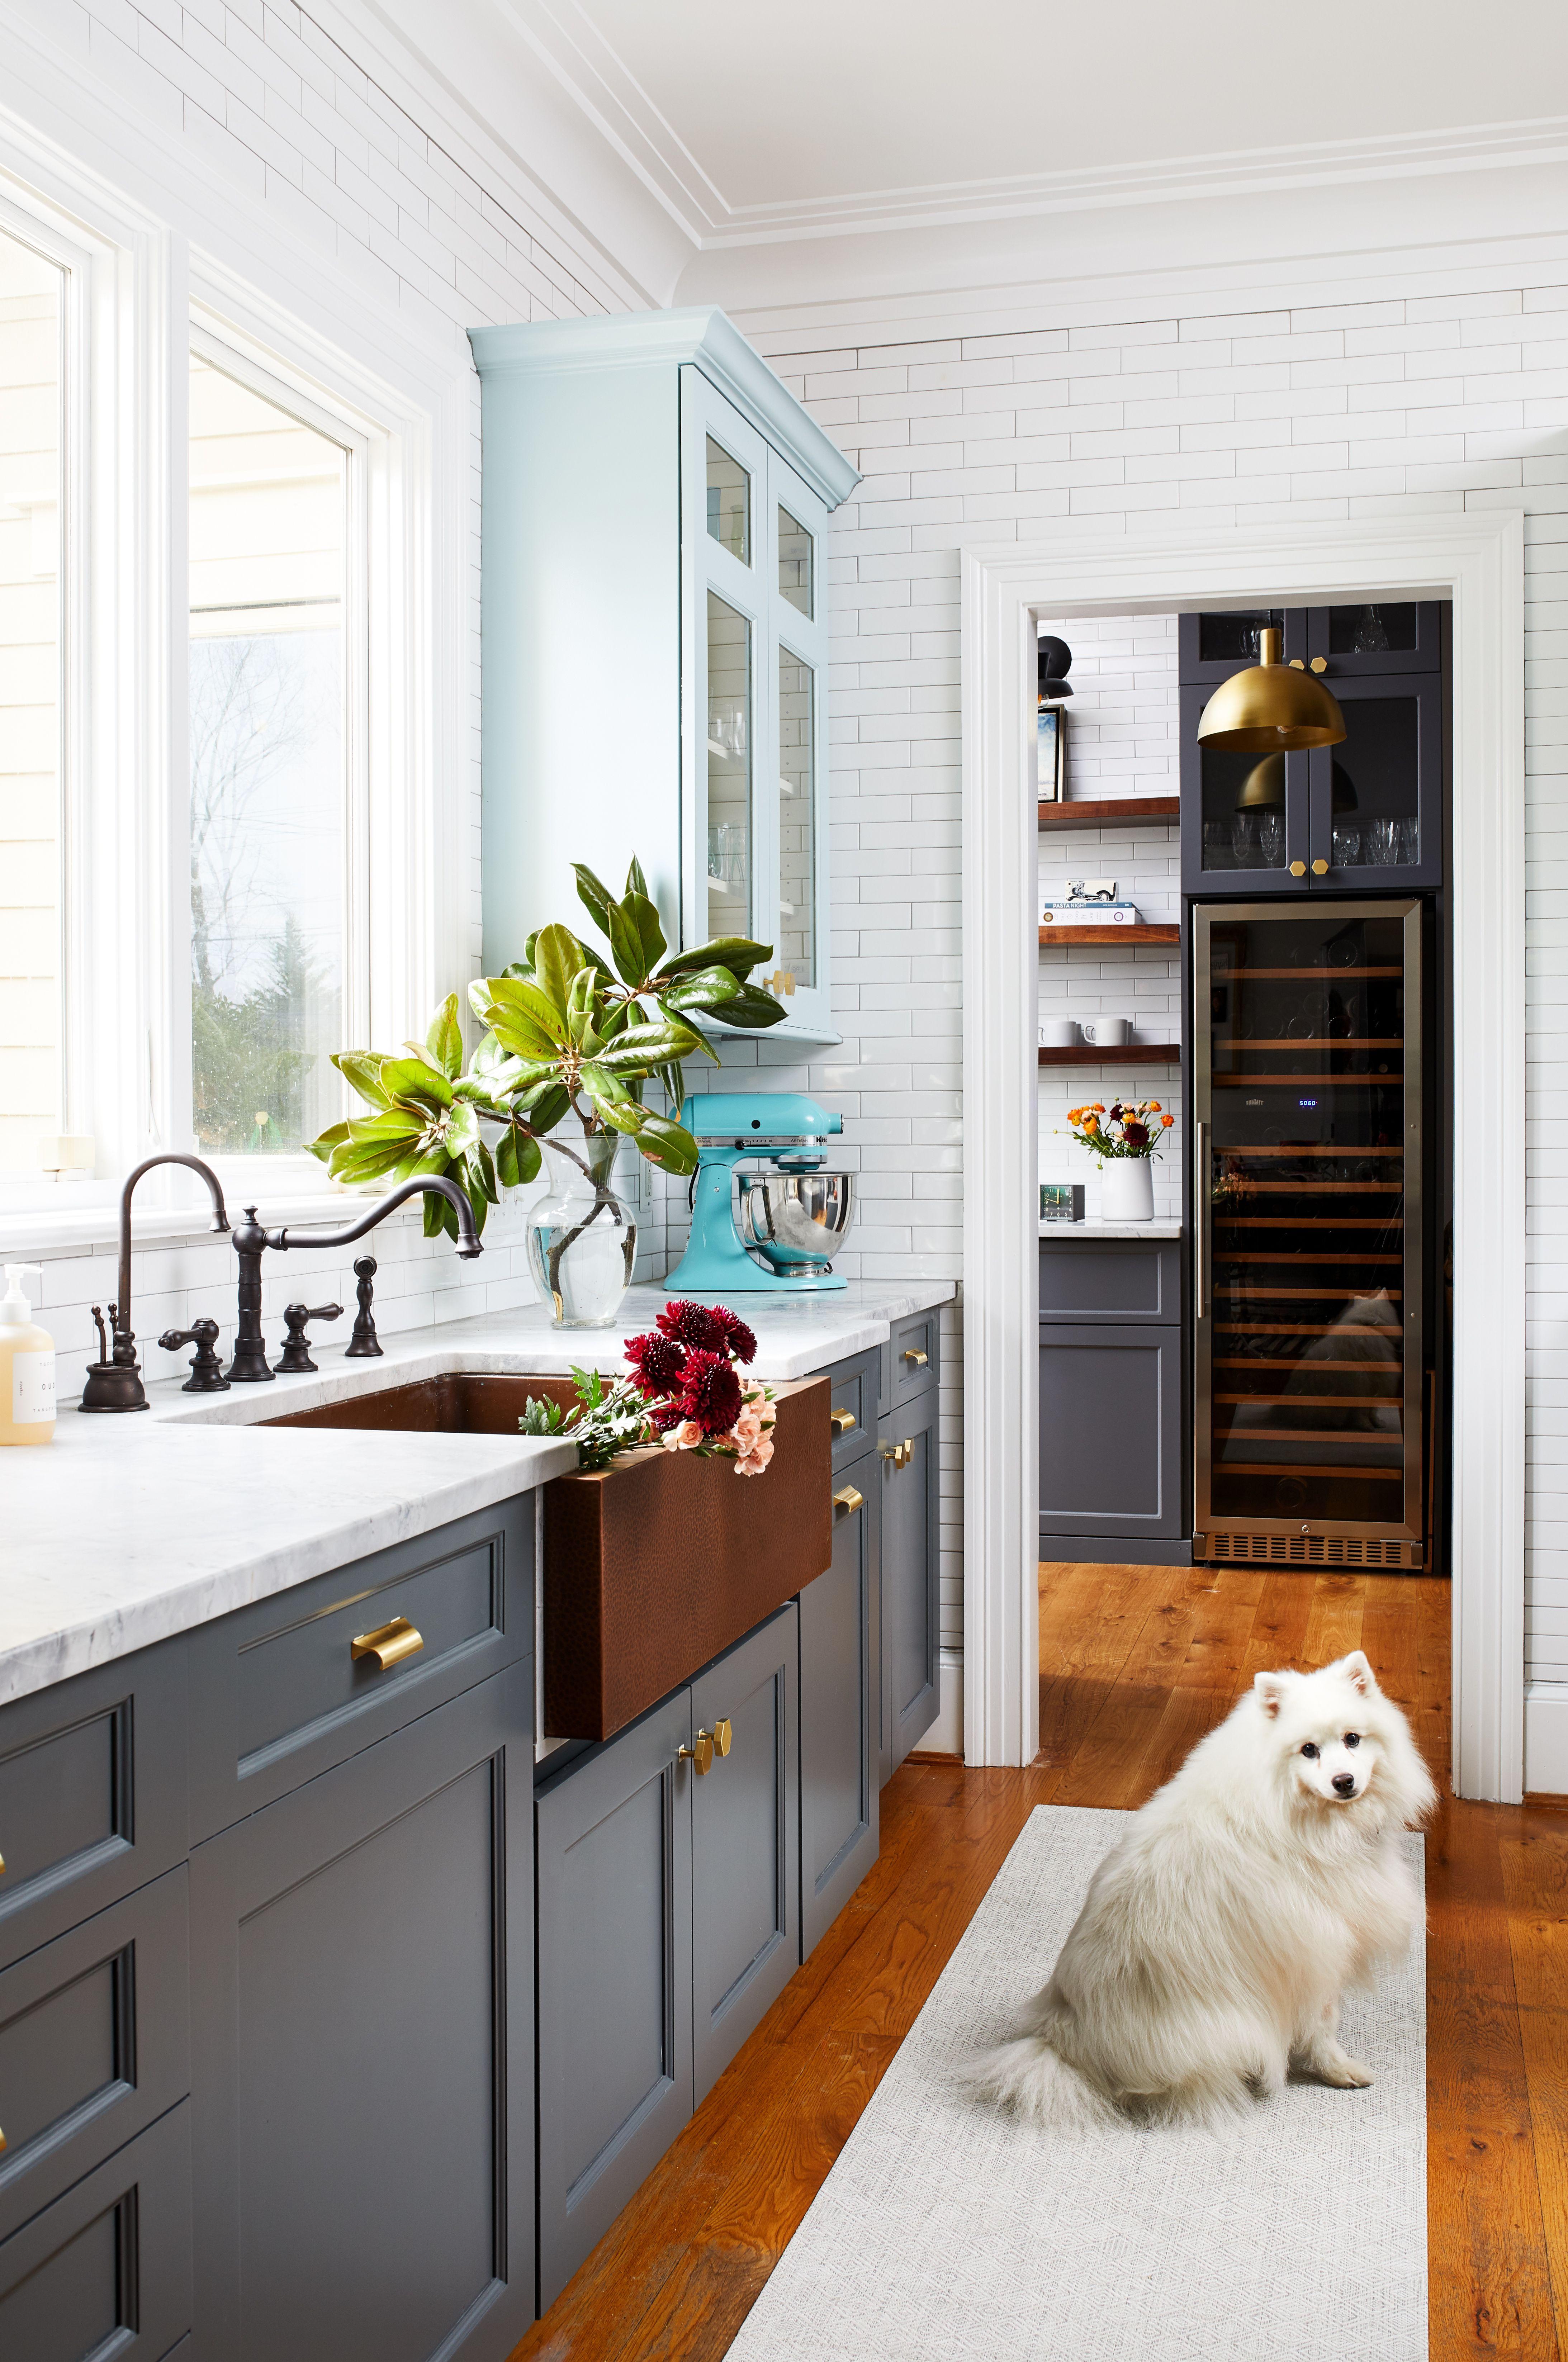 Stunning Copper Sink And An Equally Stunning Puppy Kitchen Cabinet Styles Dark Blue Kitchen Cabinets Kitchen Renovation